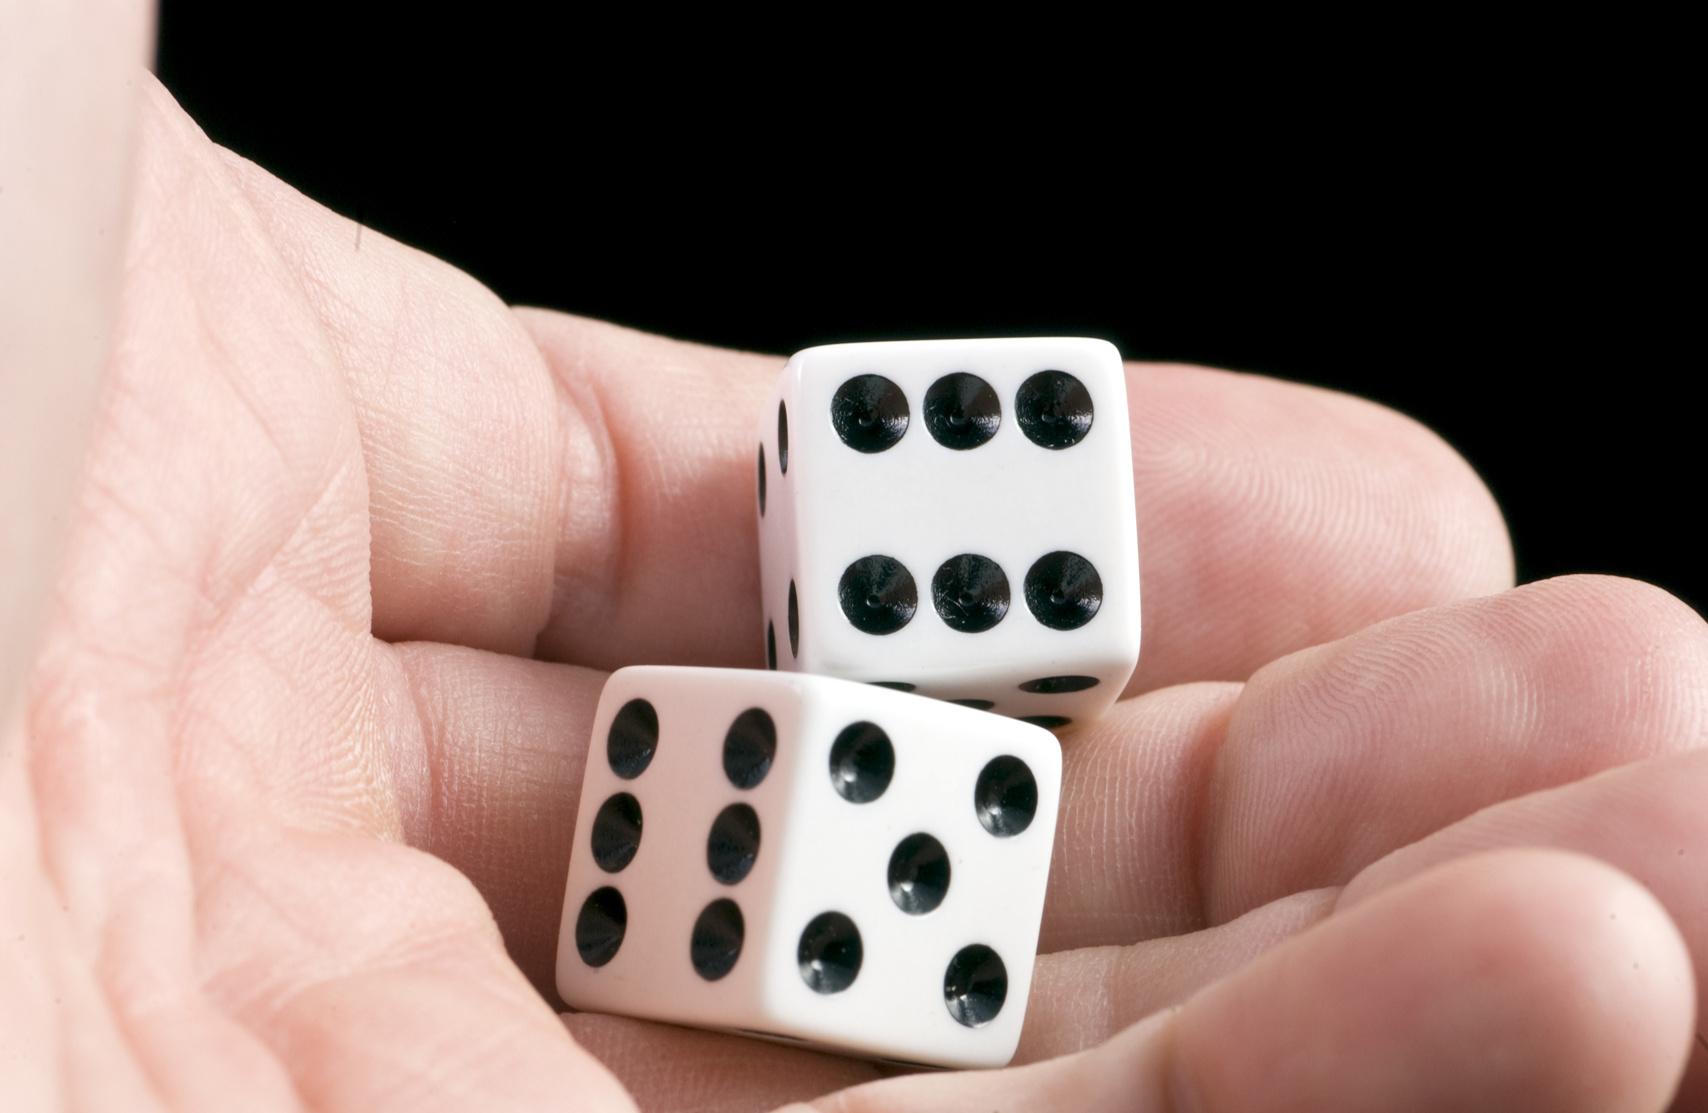 dice_hand_probability